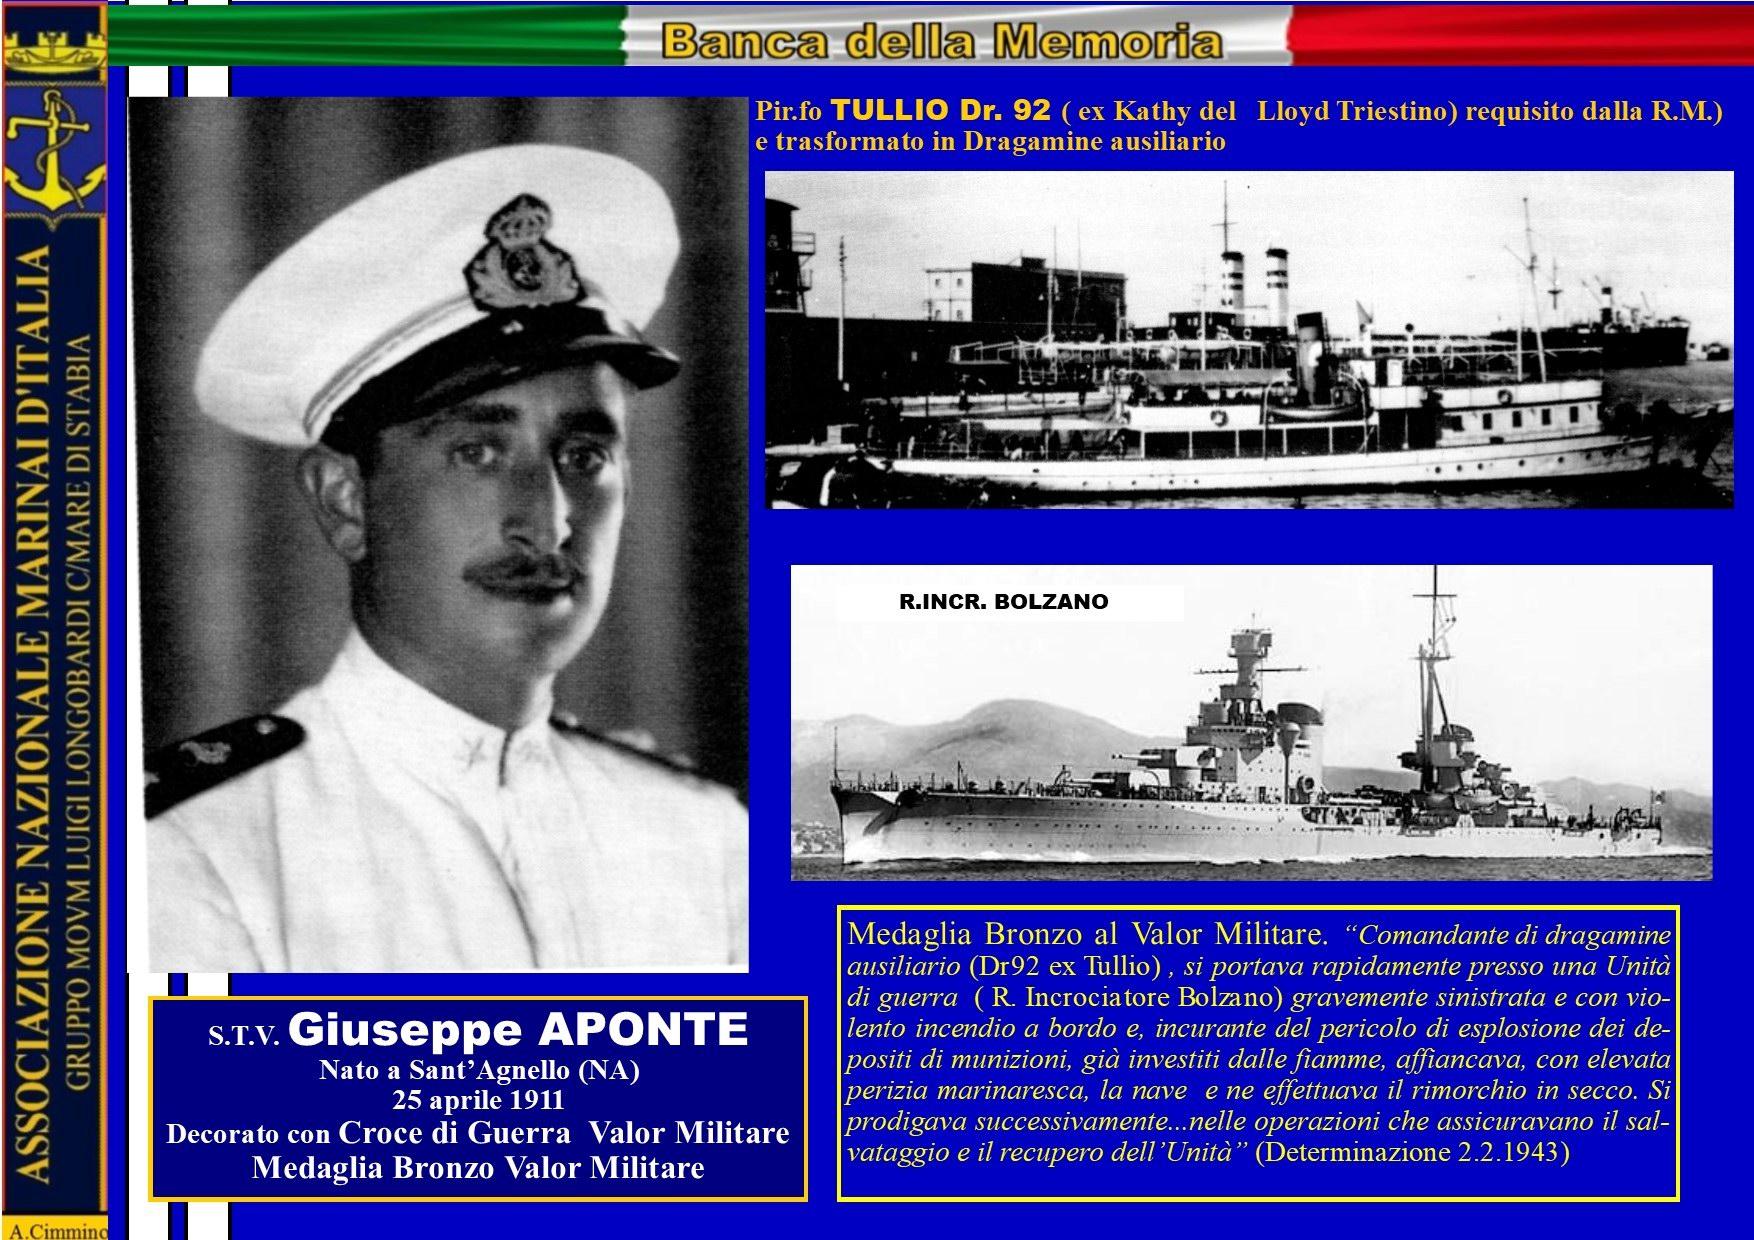 Aponte Giuseppe